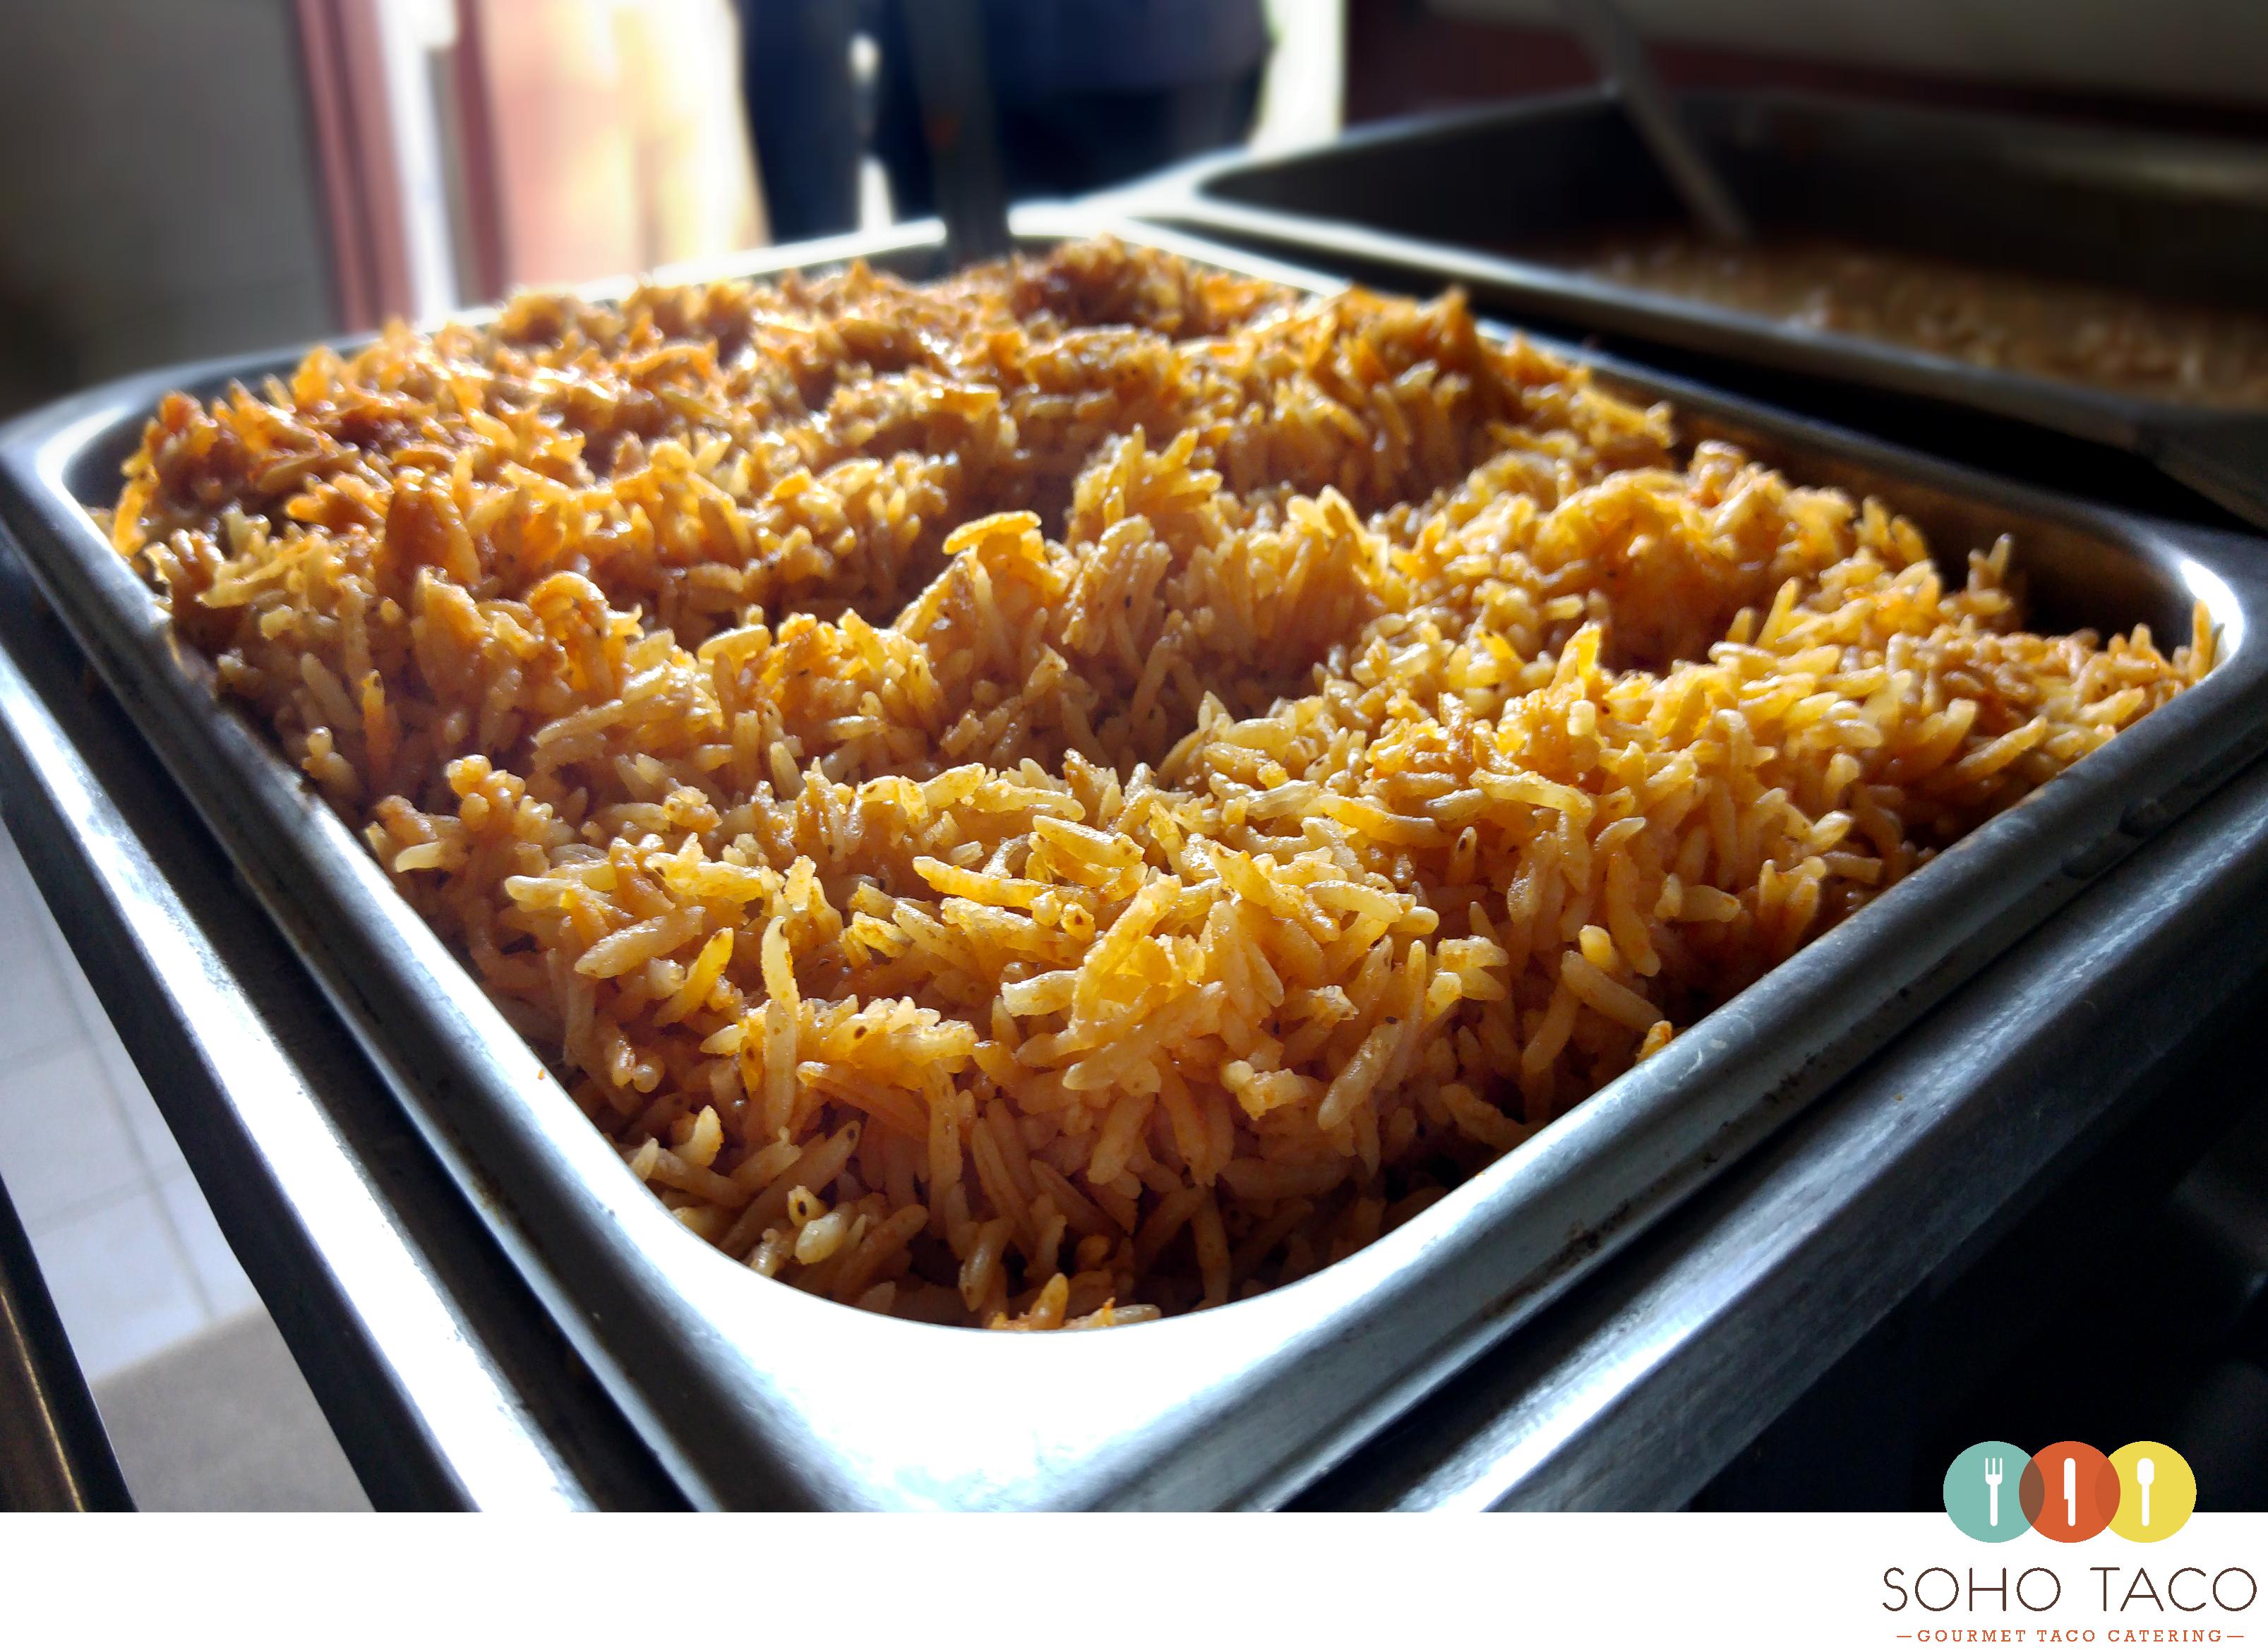 SOHO TACO Gourmet Taco Catering - Earl Warren Showgrounds - Santa Barbara - Spanish Rice